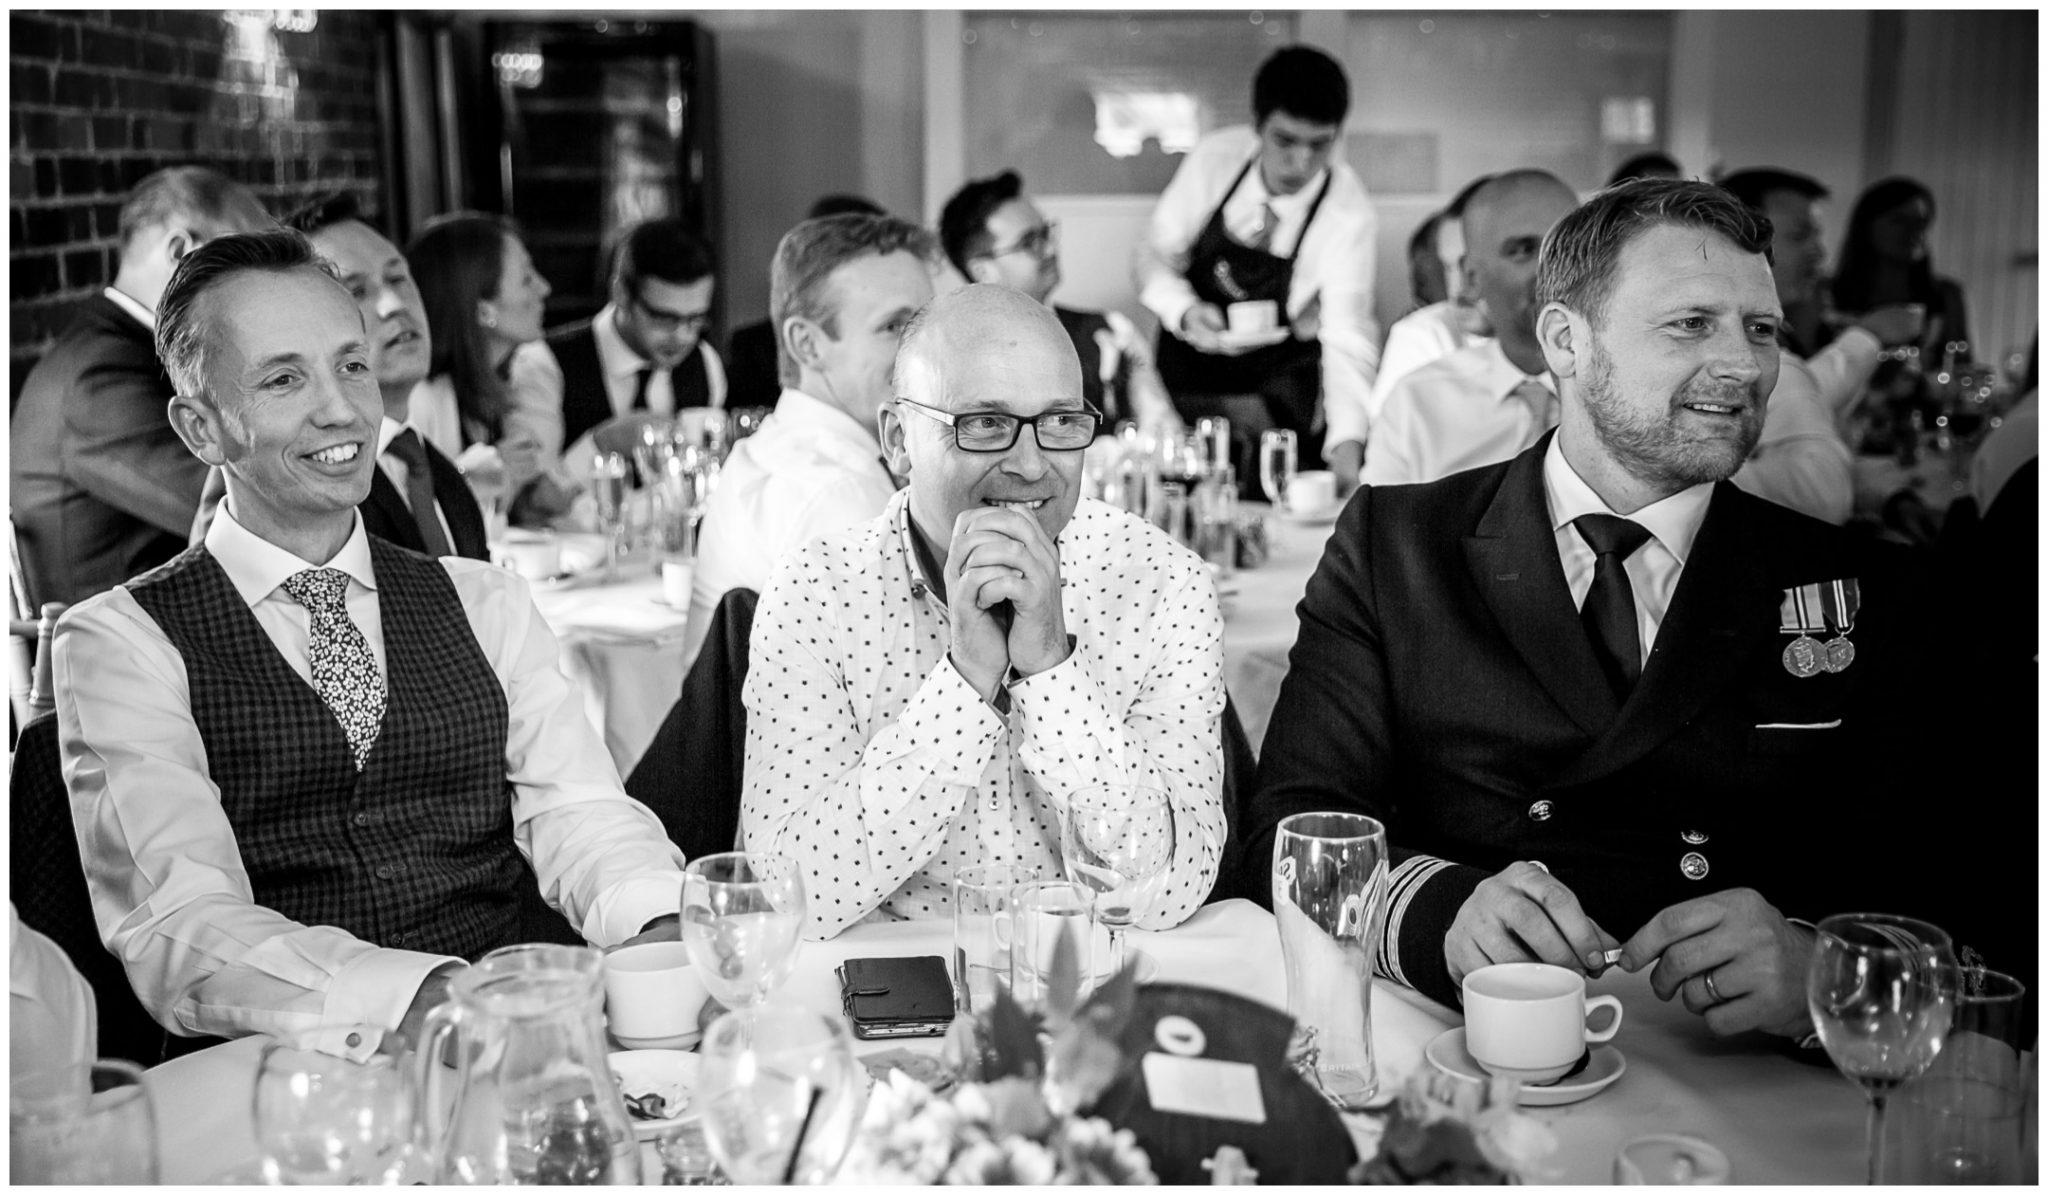 Sopley wedding photographer candid photos